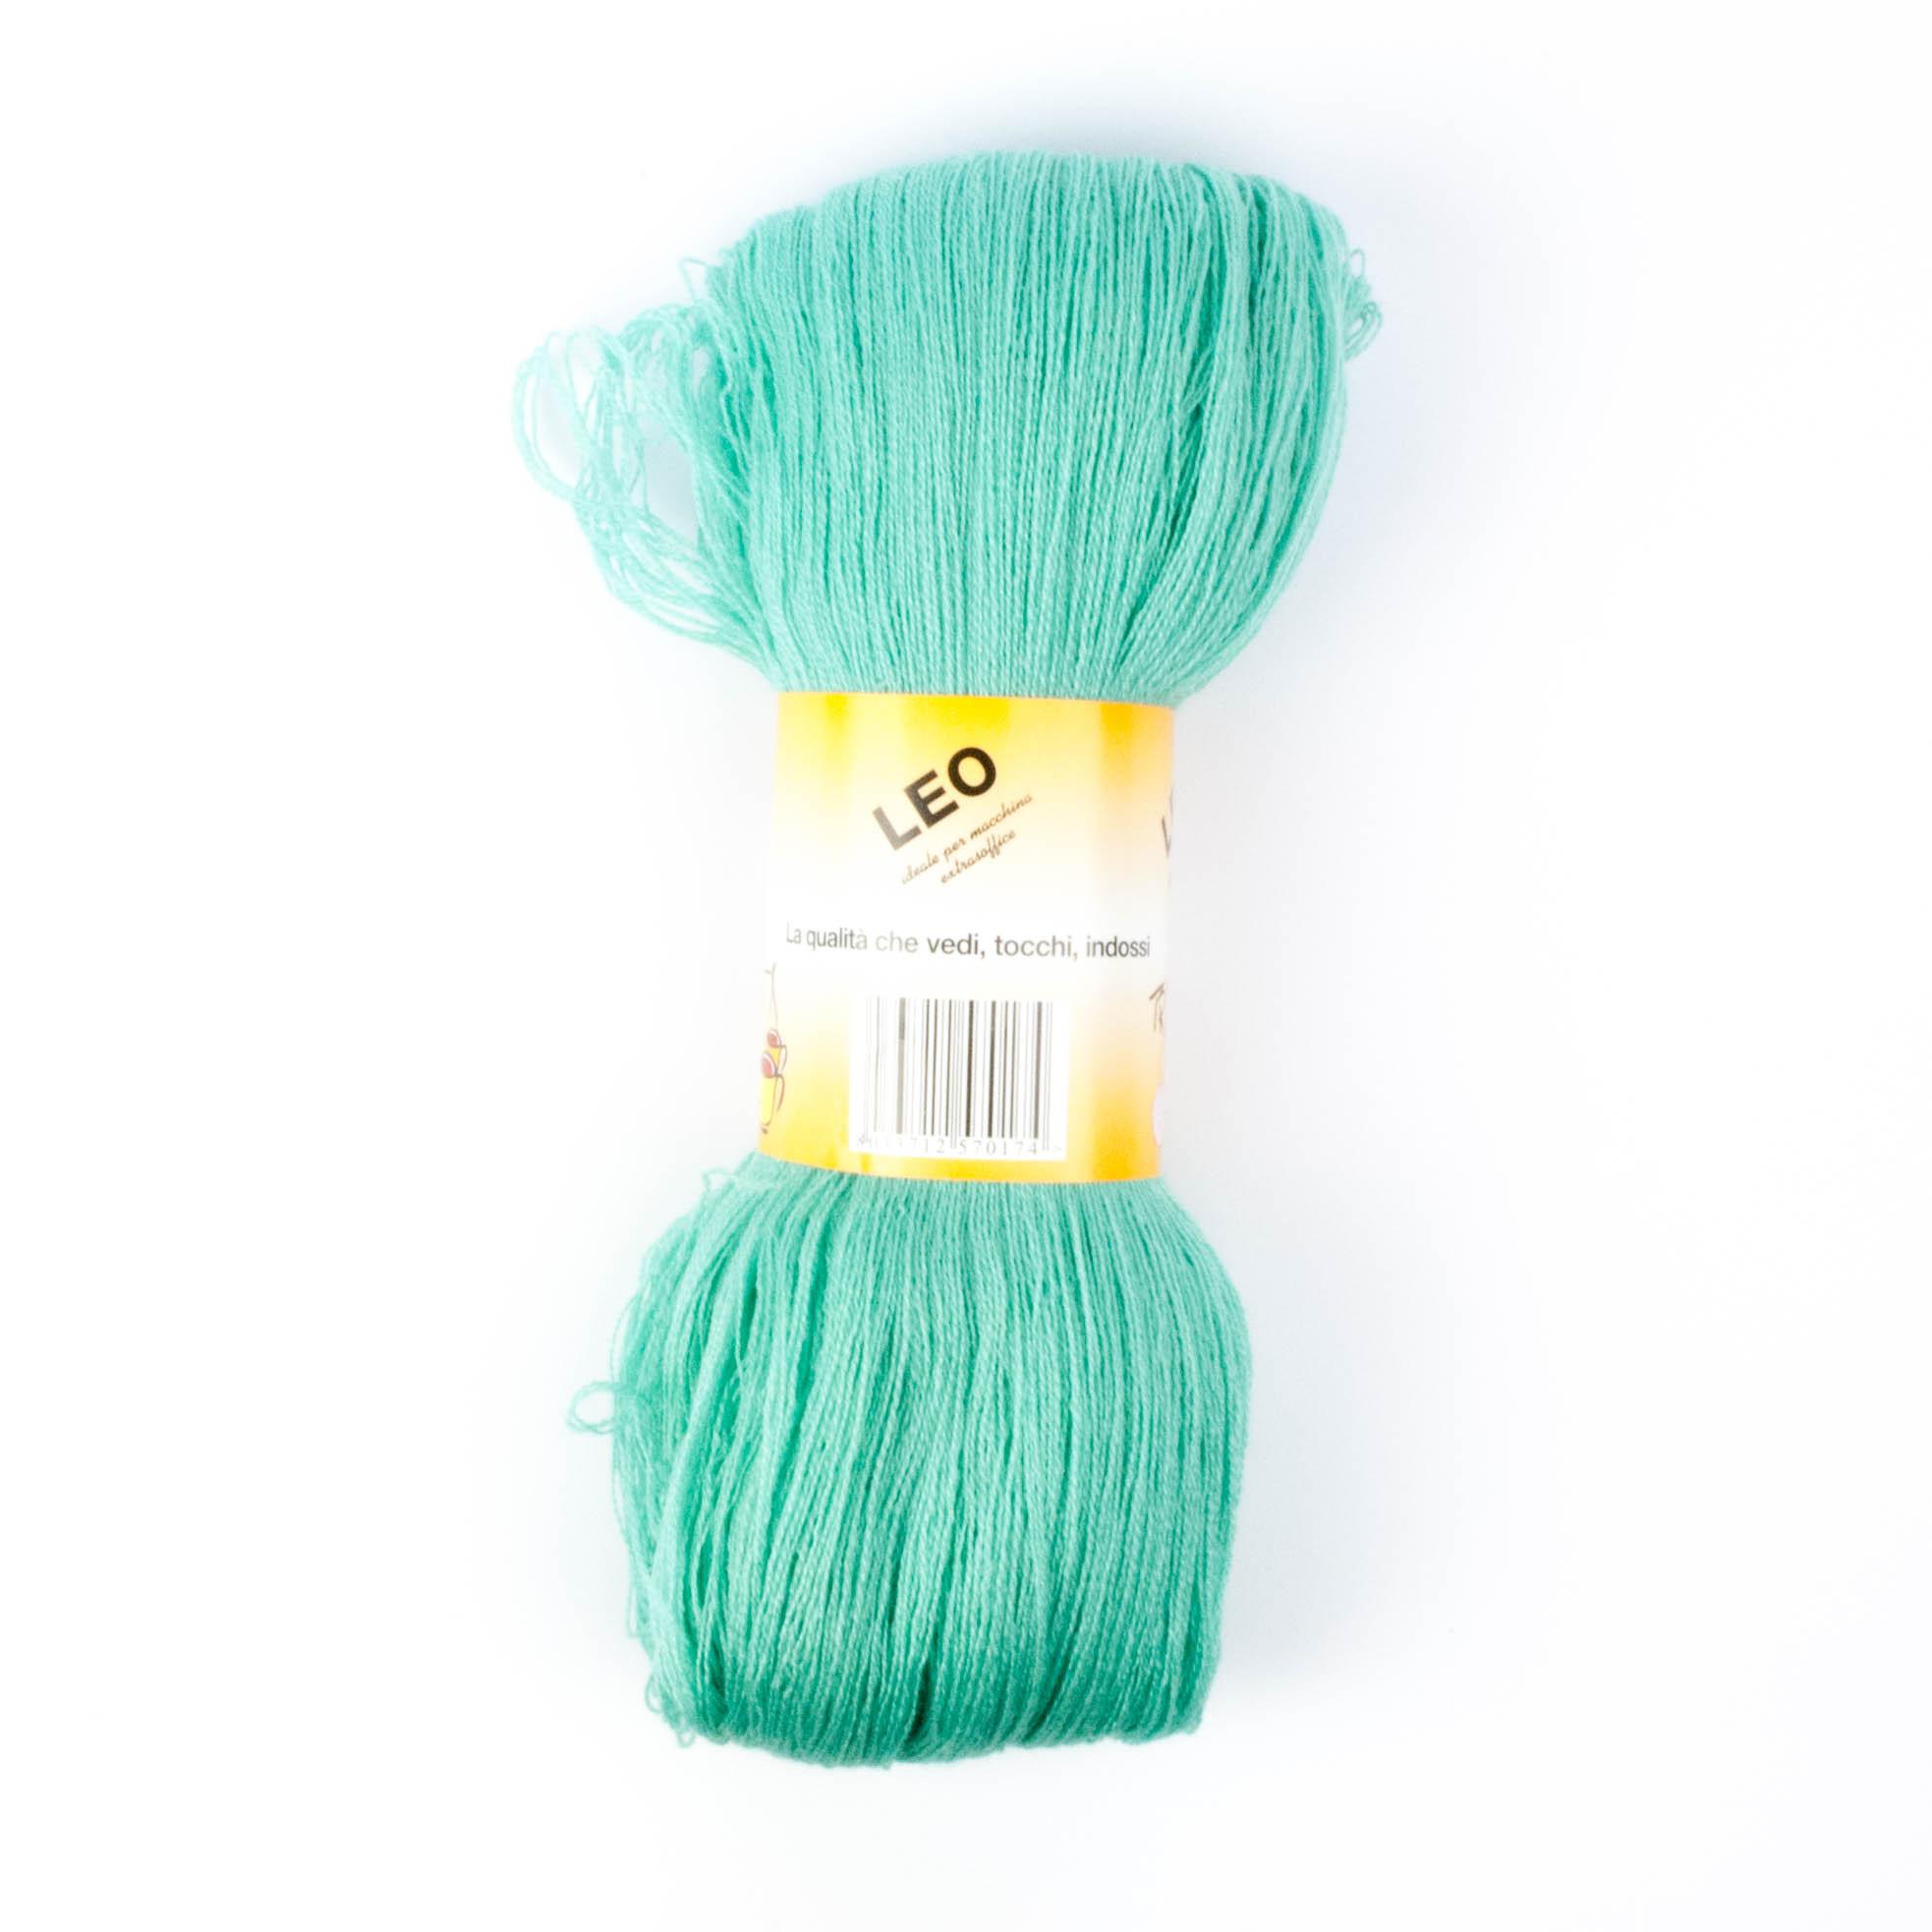 Leo - Matassa misto lana ideale per lavori a mano e macchina - Tiffany 13